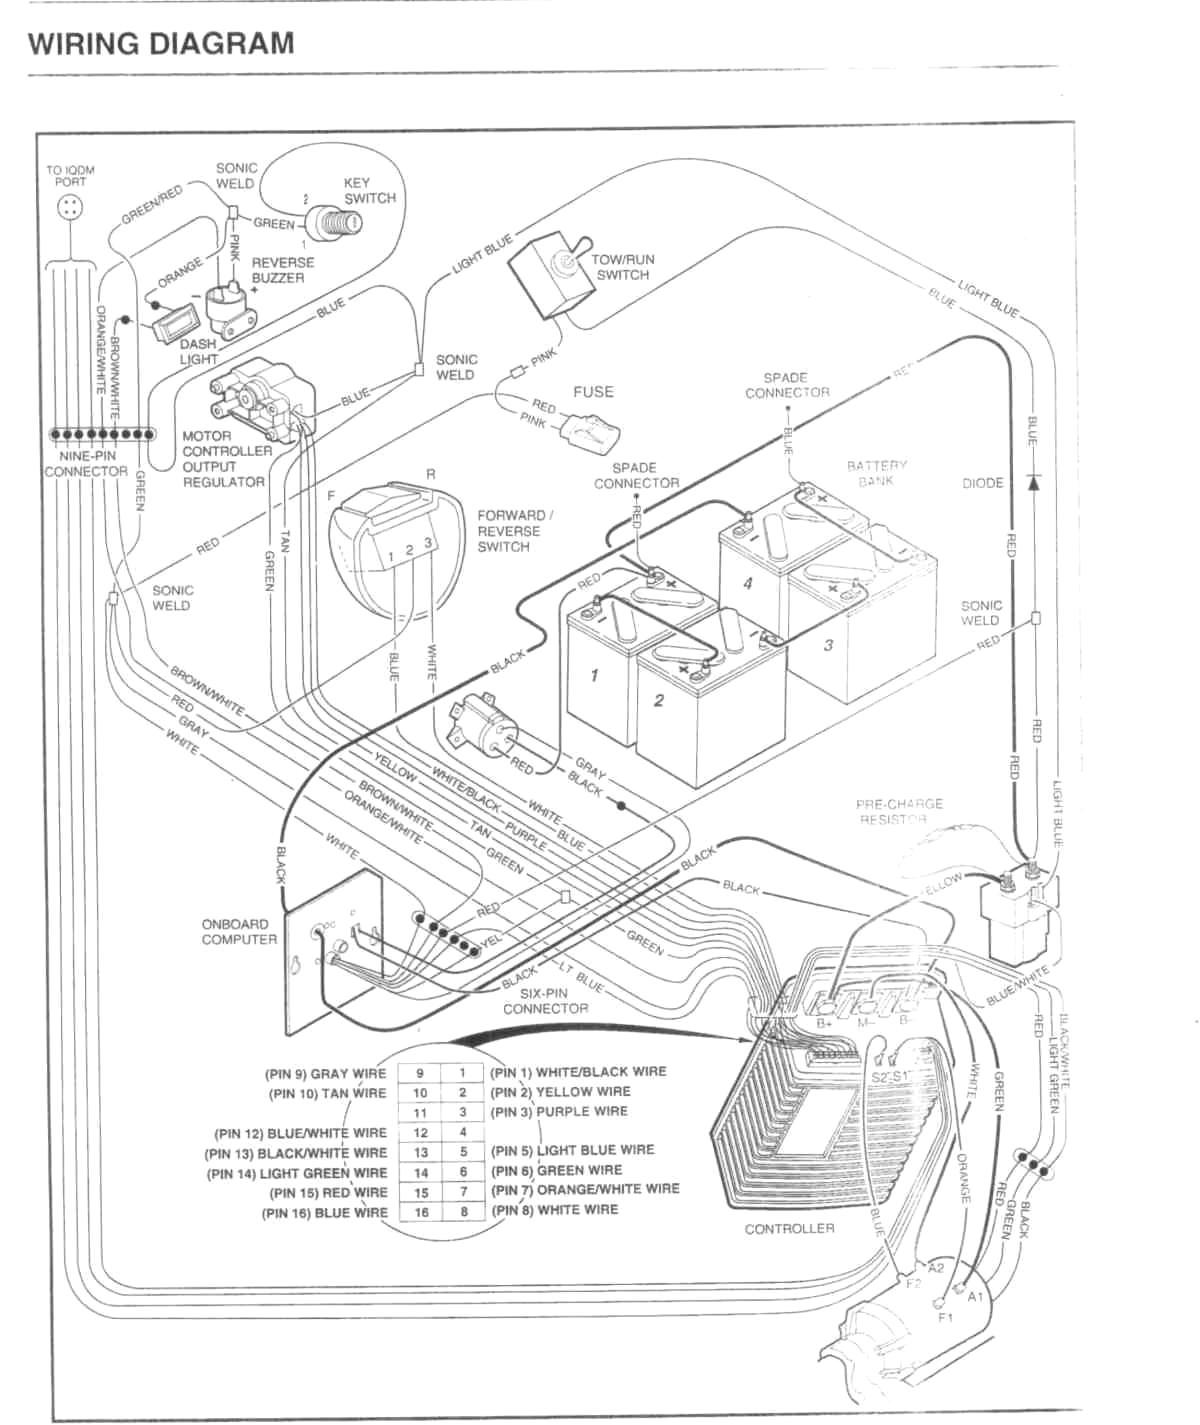 Gas Club Car Wiring Diagram | Wiring Diagram Database New Car Wiring Diagram on 7.3 ford diesel diagrams, chevy truck diagrams, car battery, pinout diagrams, custom stereo diagrams, factory car stereo diagrams, battery diagrams, car vacuum diagrams, car starting system, car electrical, autozone repair diagrams, car door lock diagram, car parts diagrams, dodge ram vacuum diagrams, car motors diagrams, car schematics, club car manual wire diagrams, 3930 ford tractor parts diagrams, club car manuals and diagrams, car exhaust,